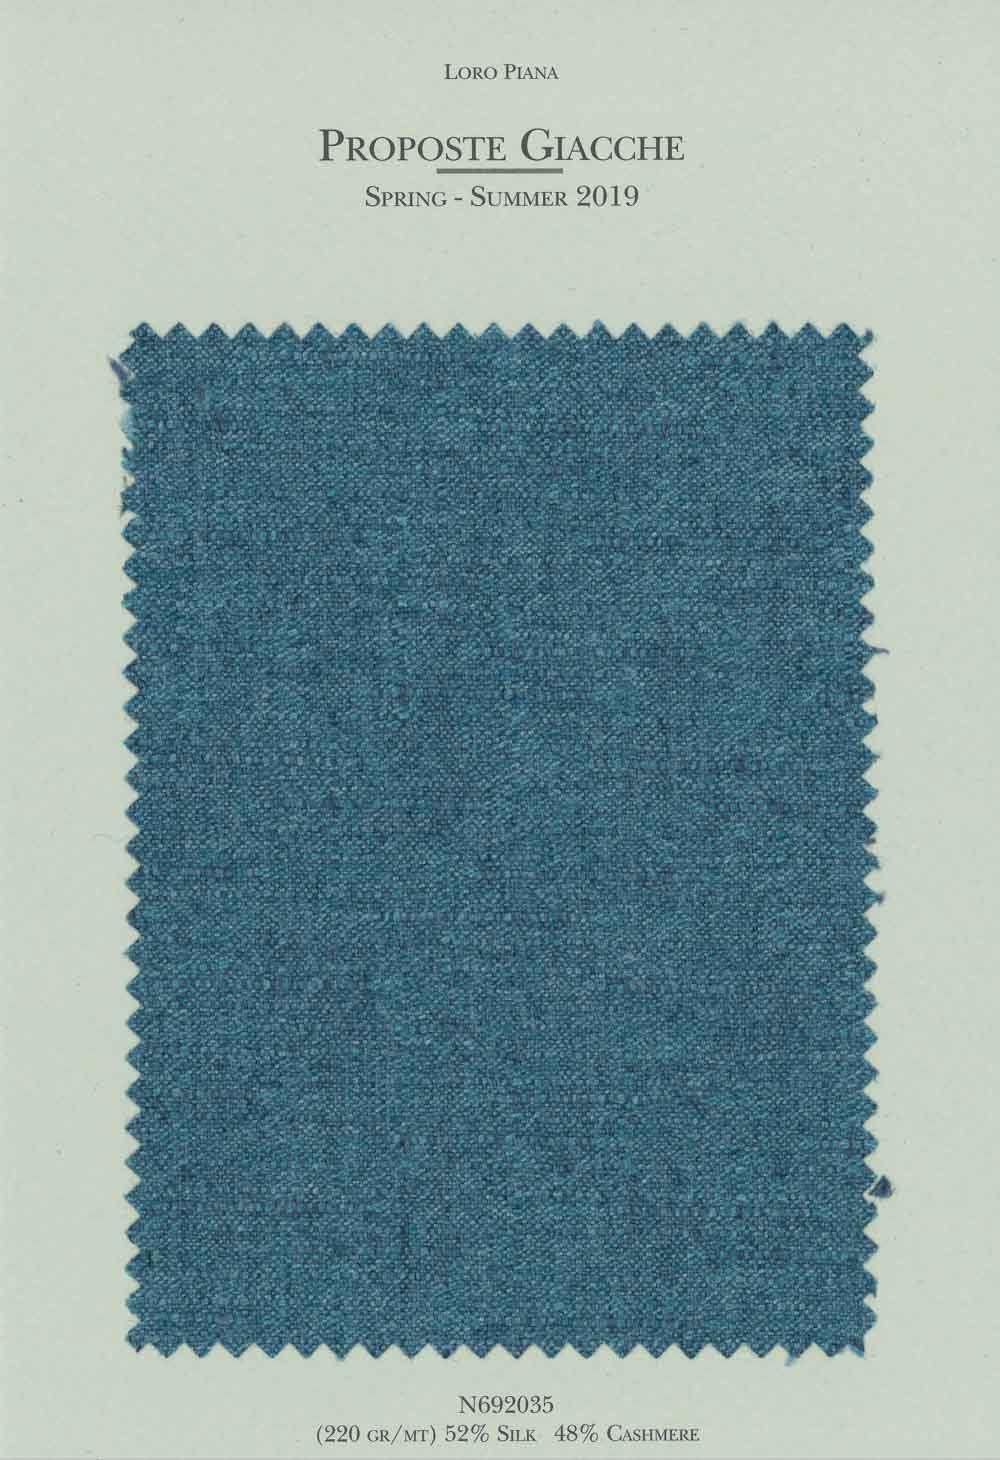 N692035